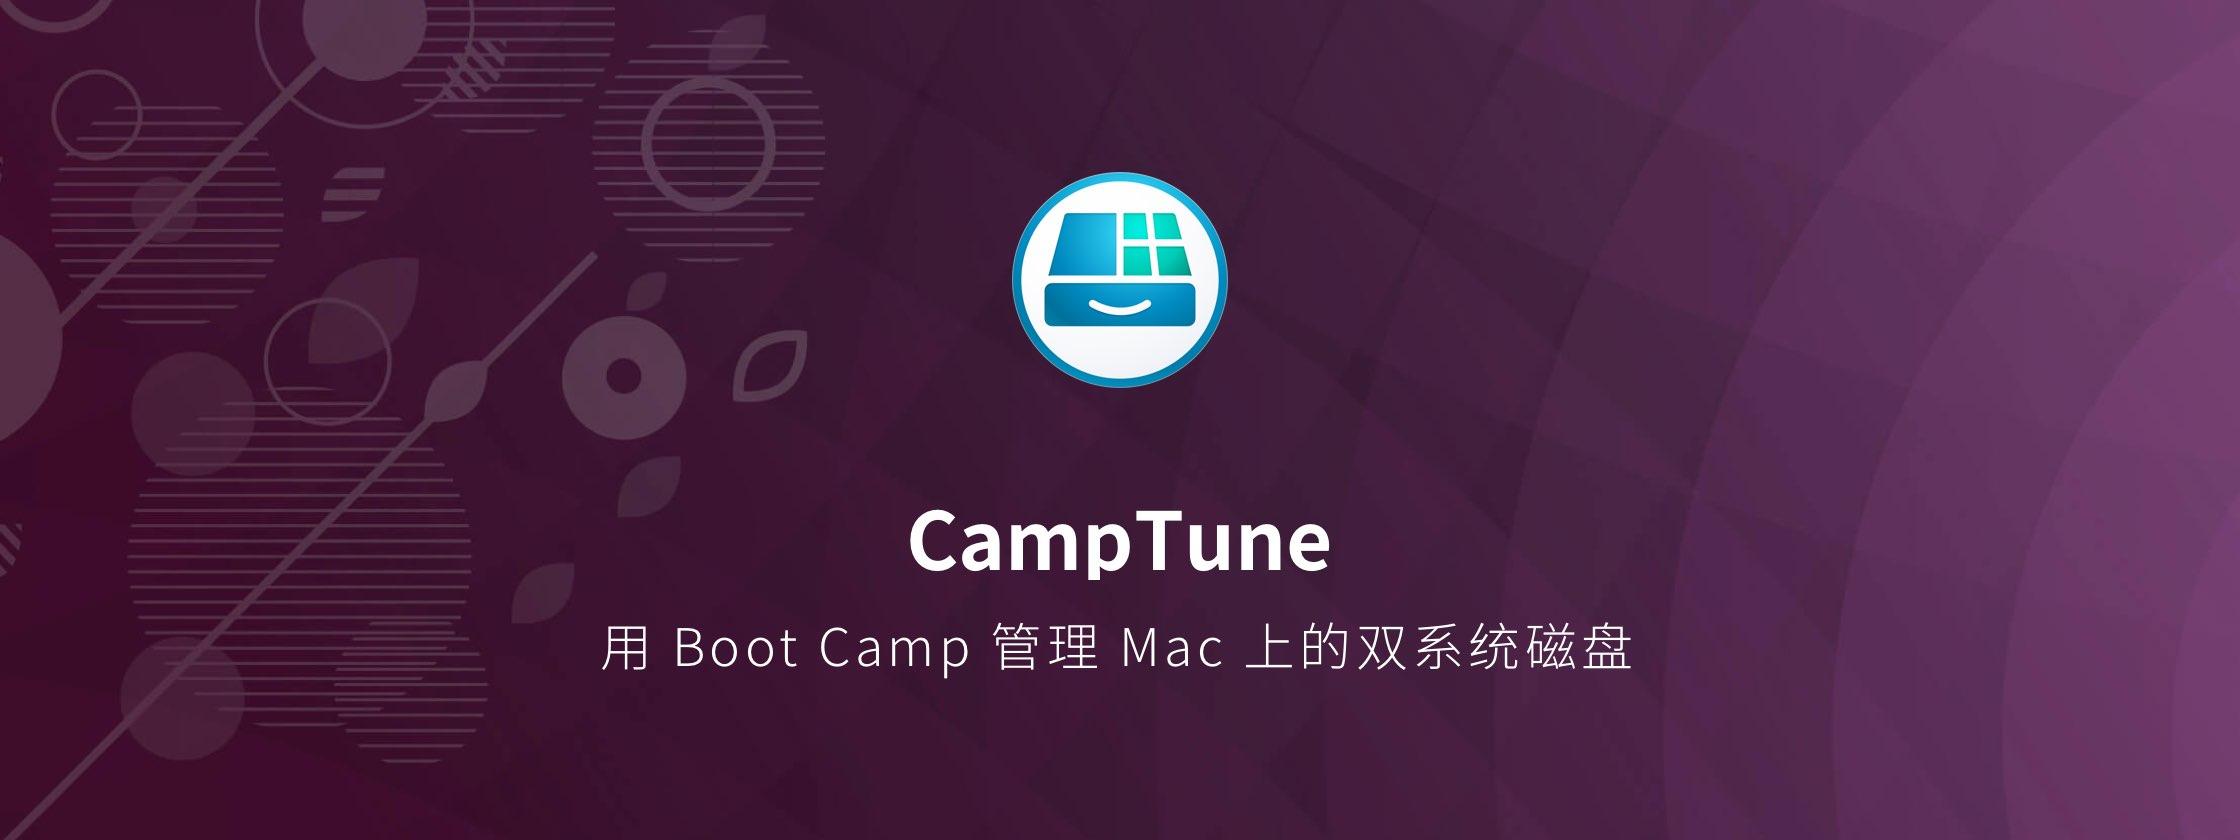 CampTune,简单并安全地在 Mac 上管理双系统磁盘空间